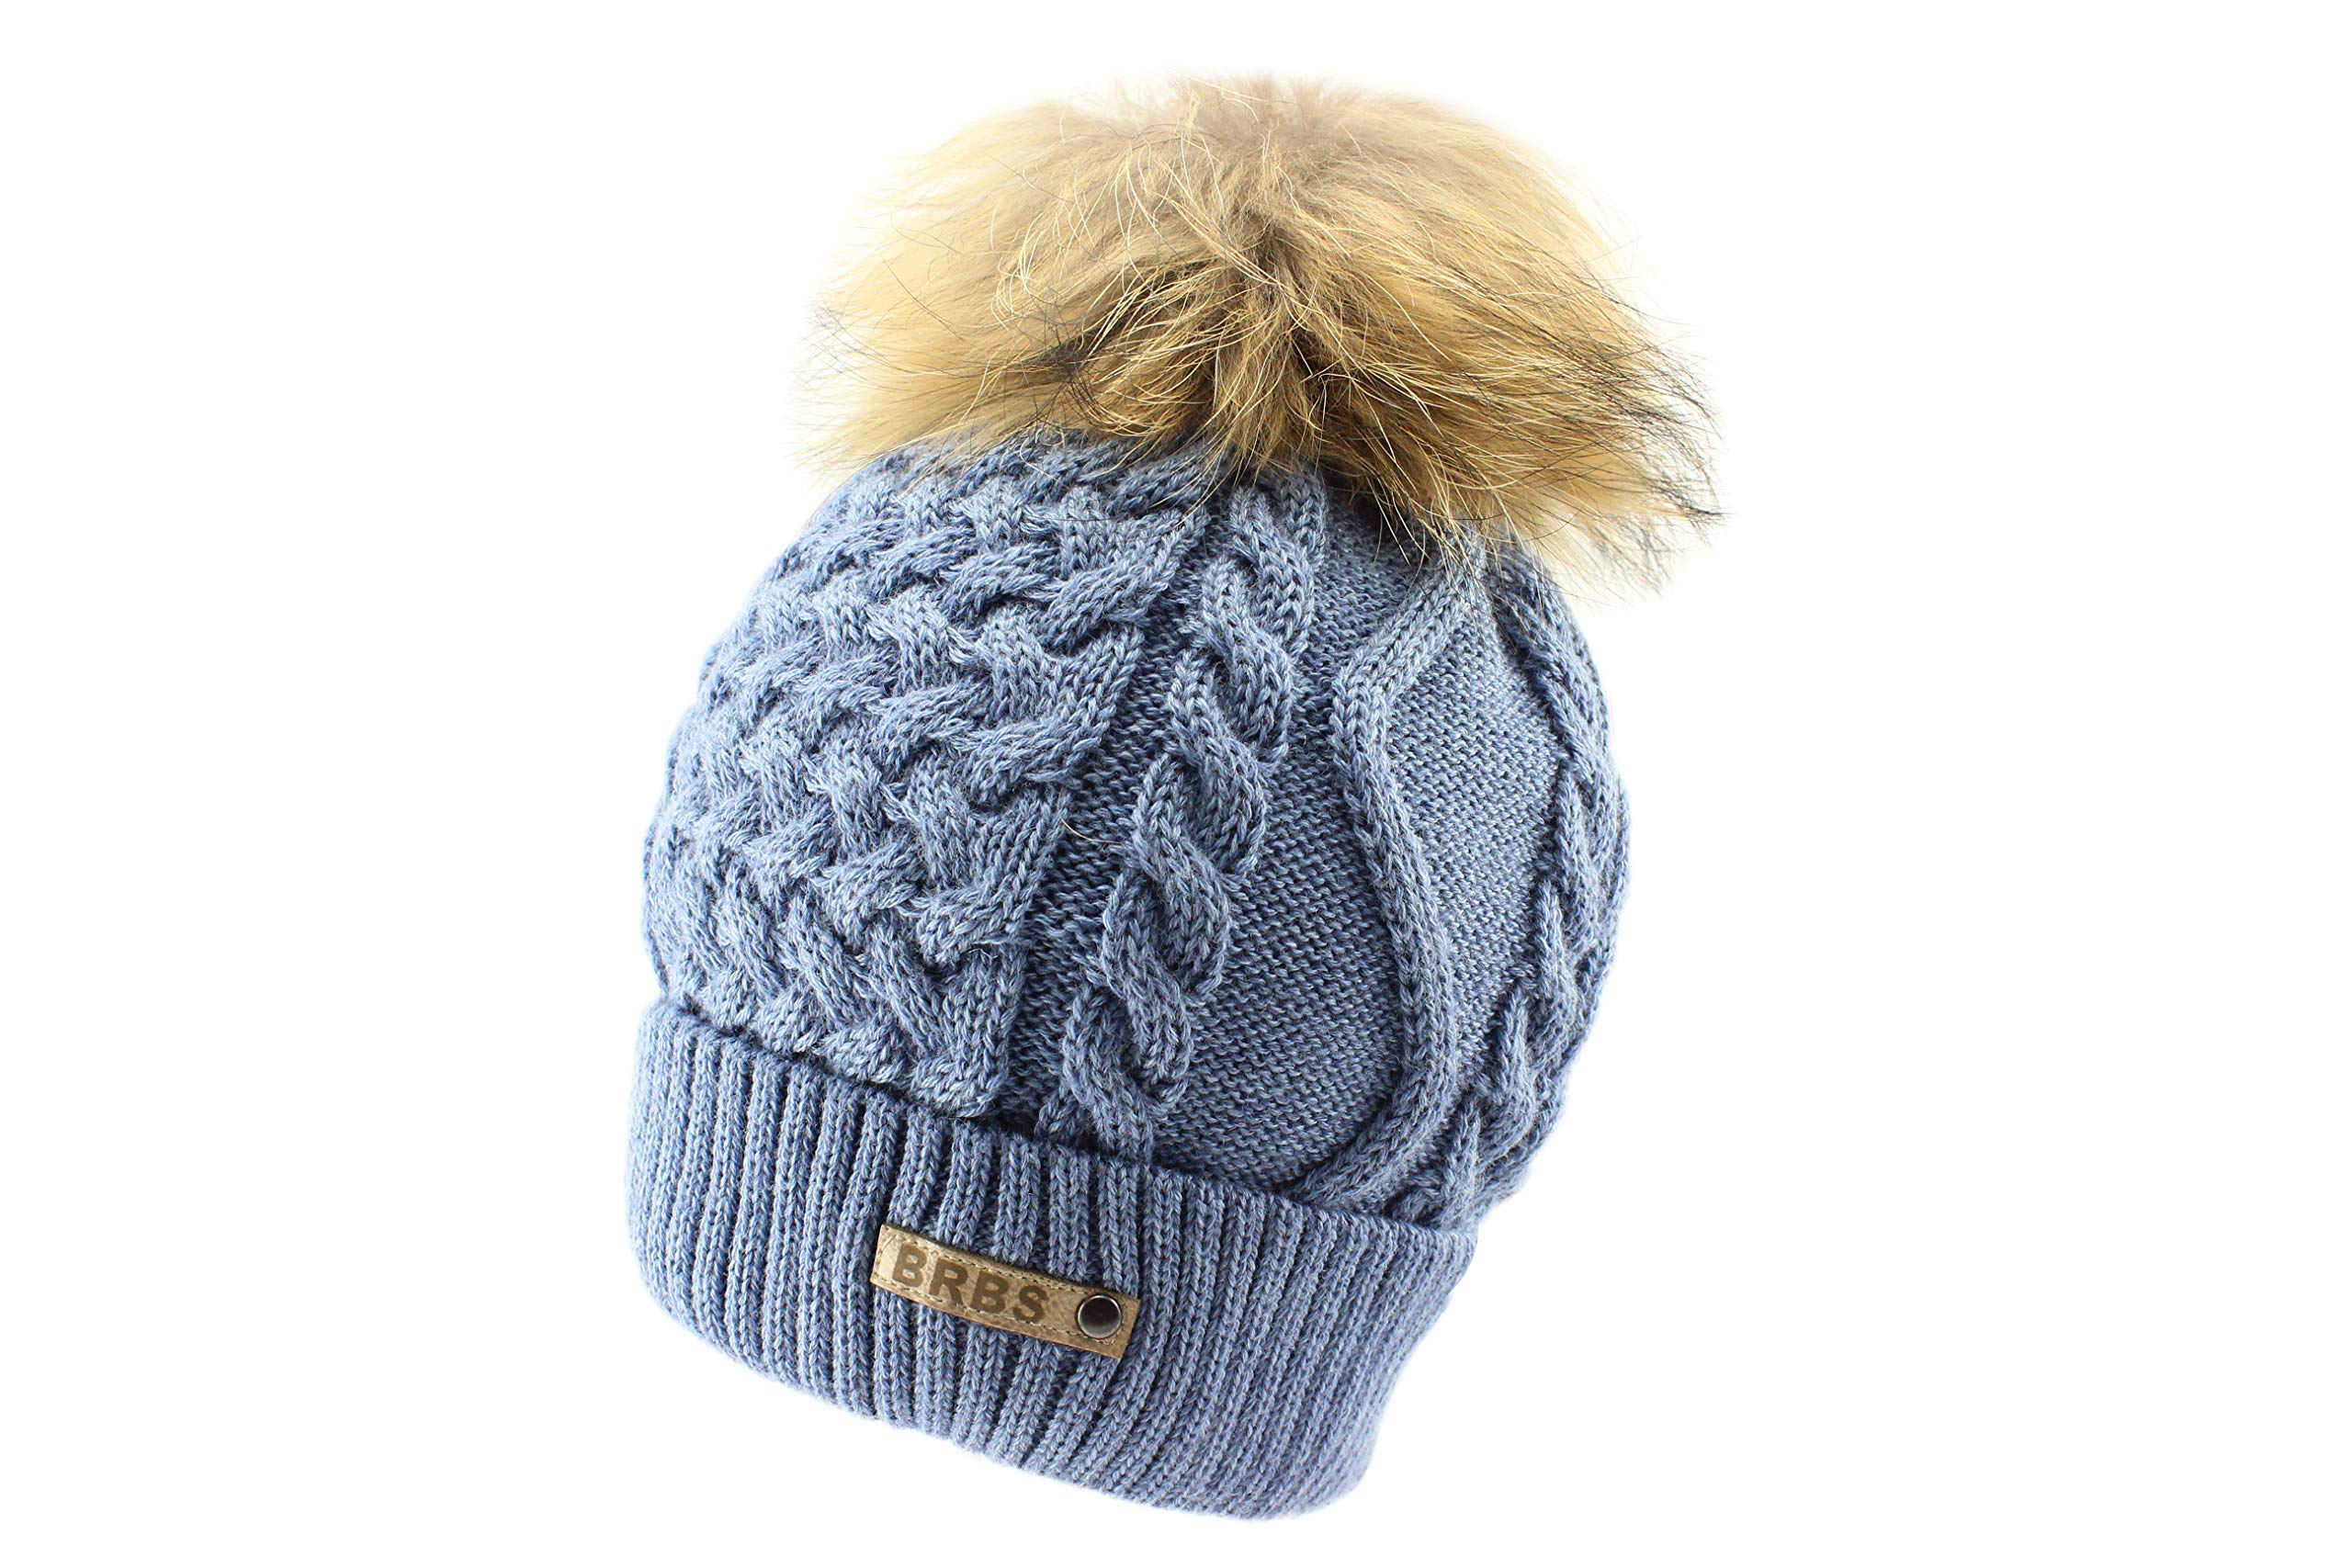 Barbaras Blue Warm Winter Natural Fur Pom Pom Beanie Hat